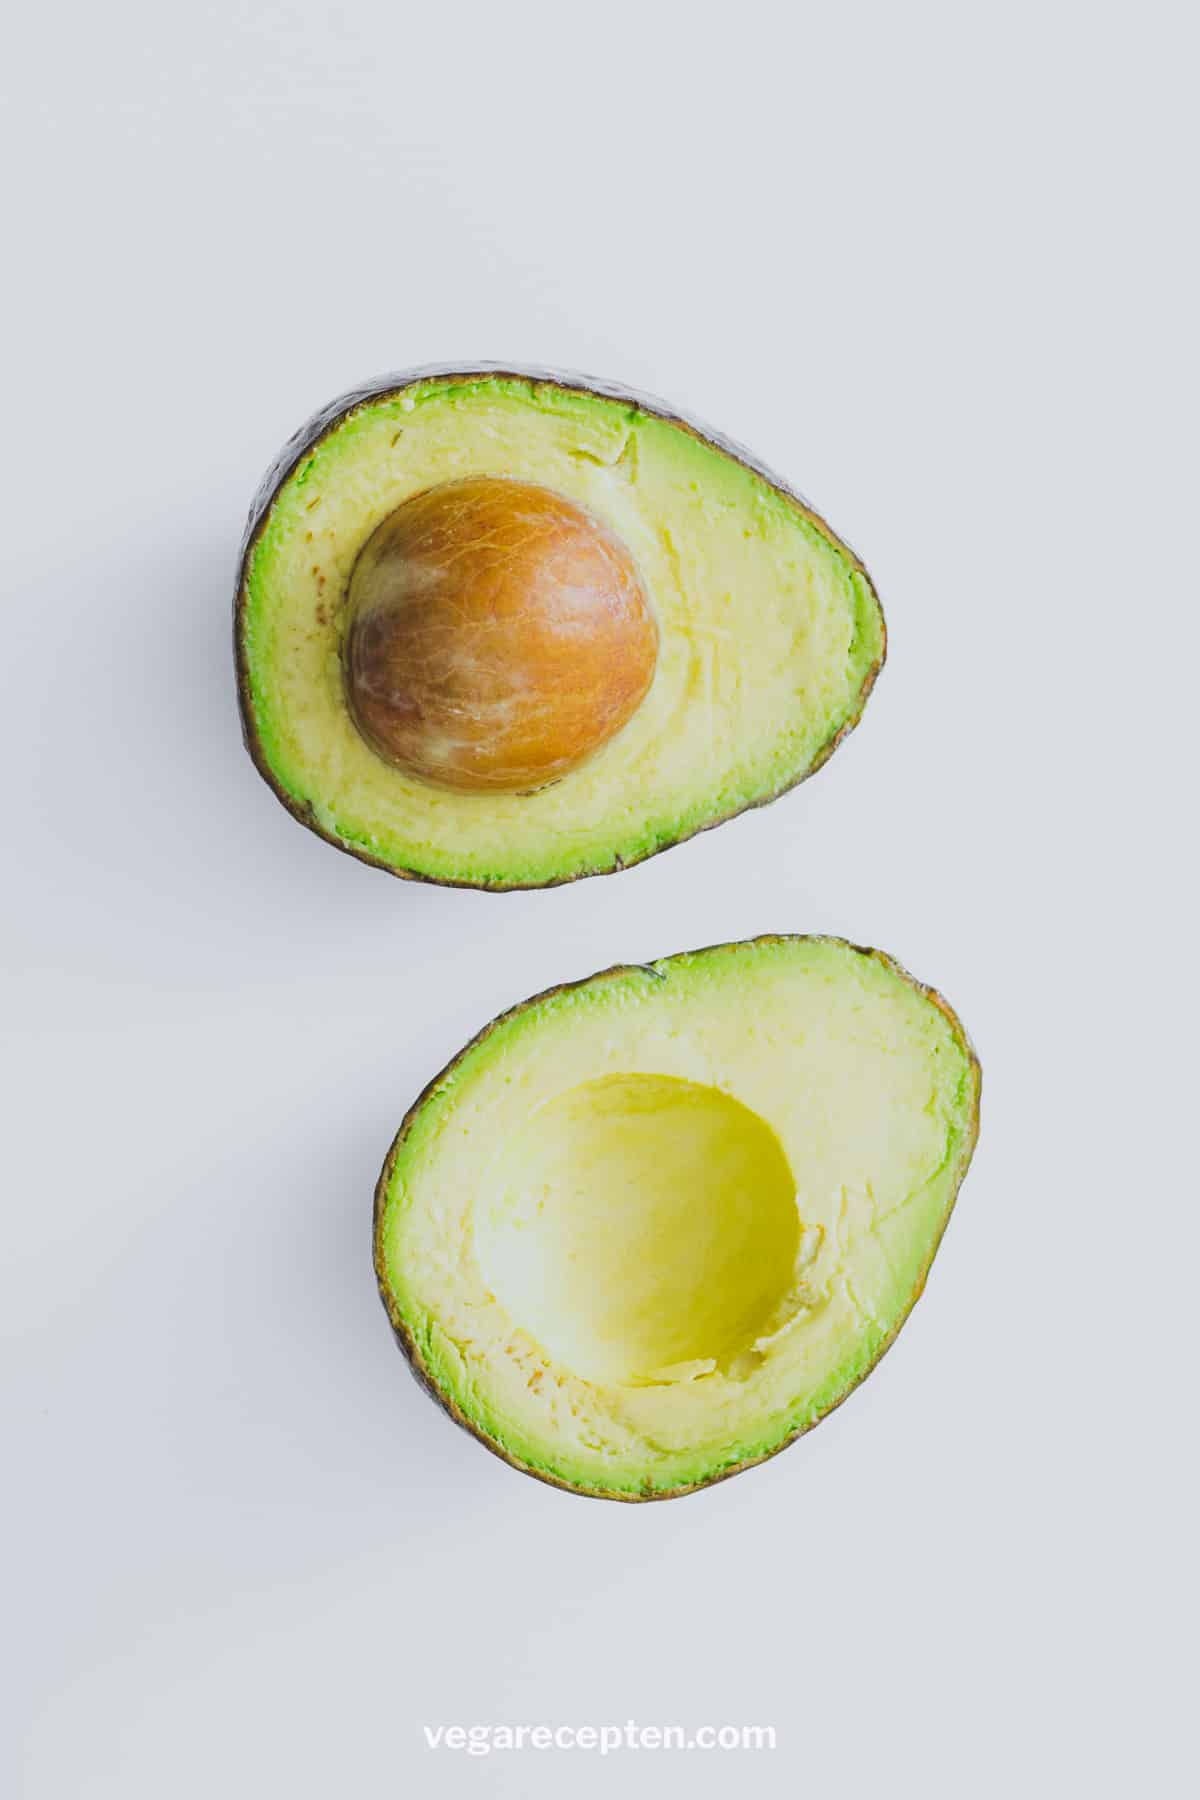 rijpe avocado